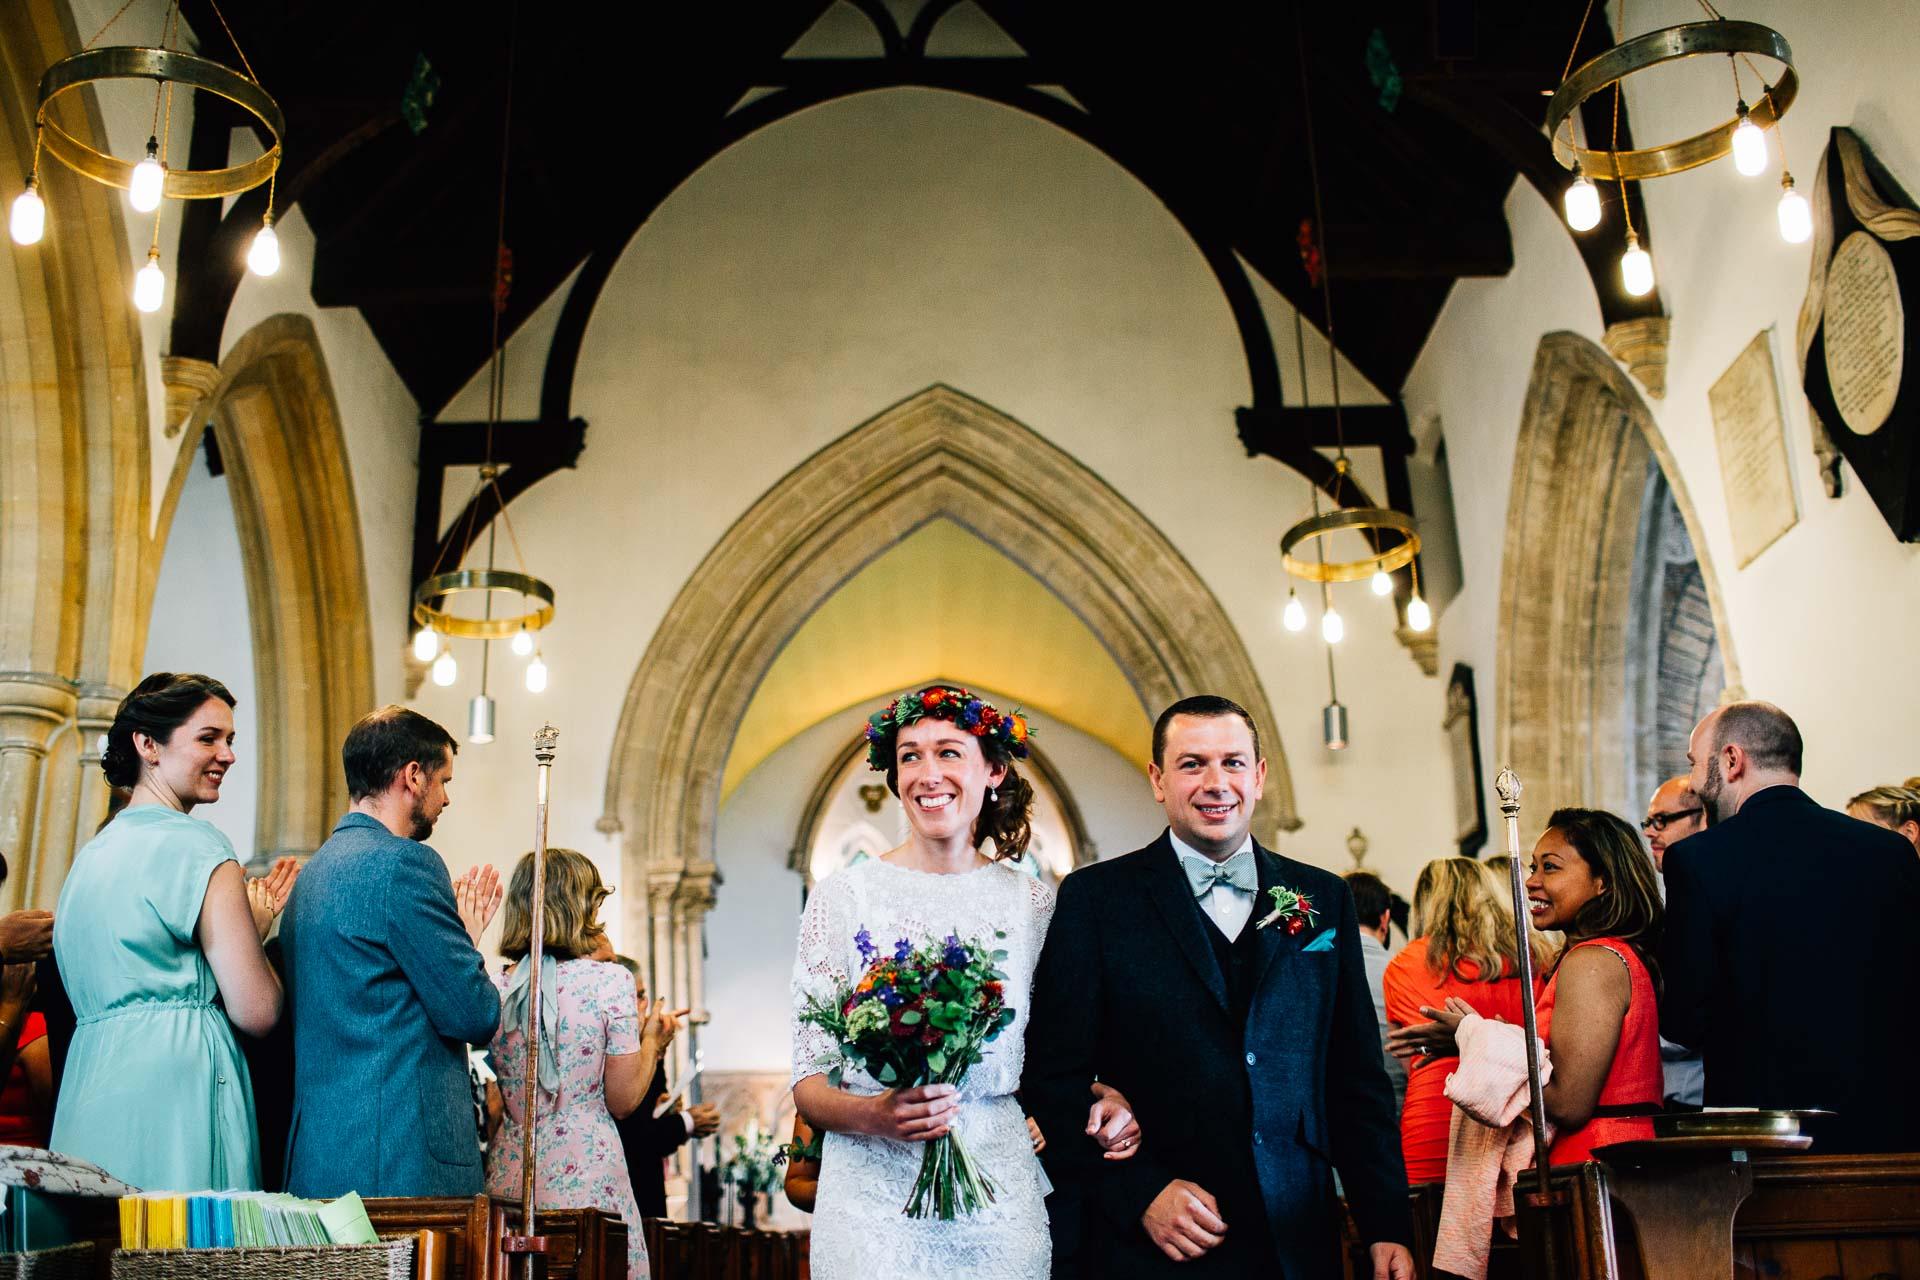 winterbourne-medieval-barn-wedding-photography-emma-andrew-61